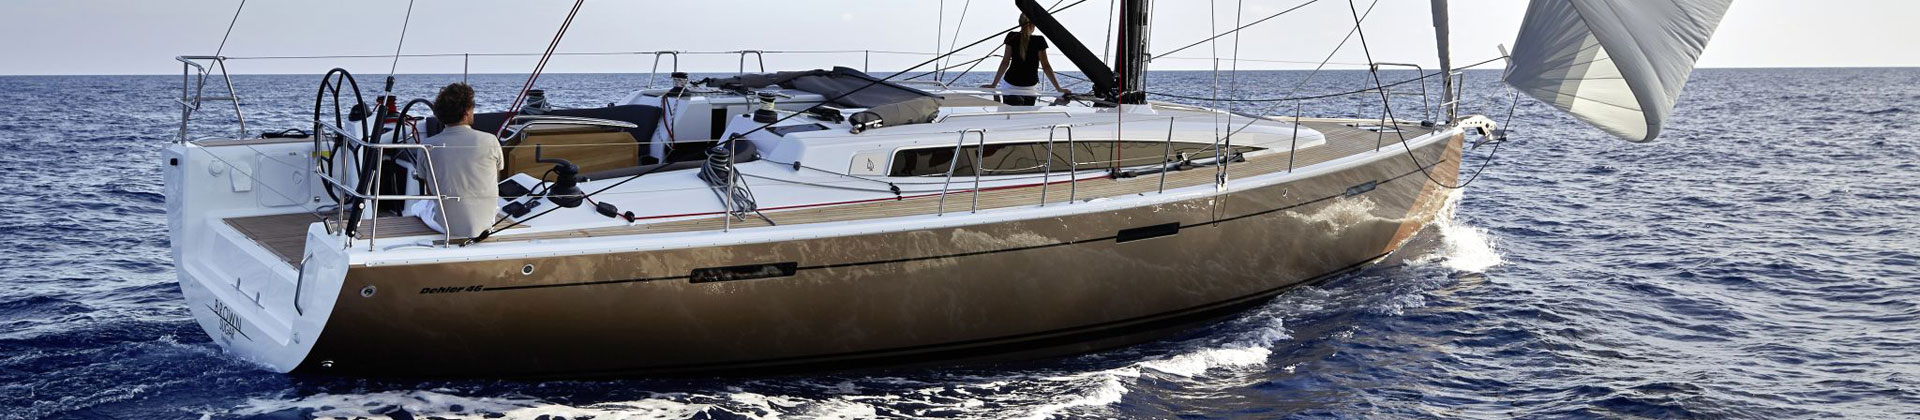 Sailboat Yacht Charter Croatia, rent sailing boat - Sailing 360